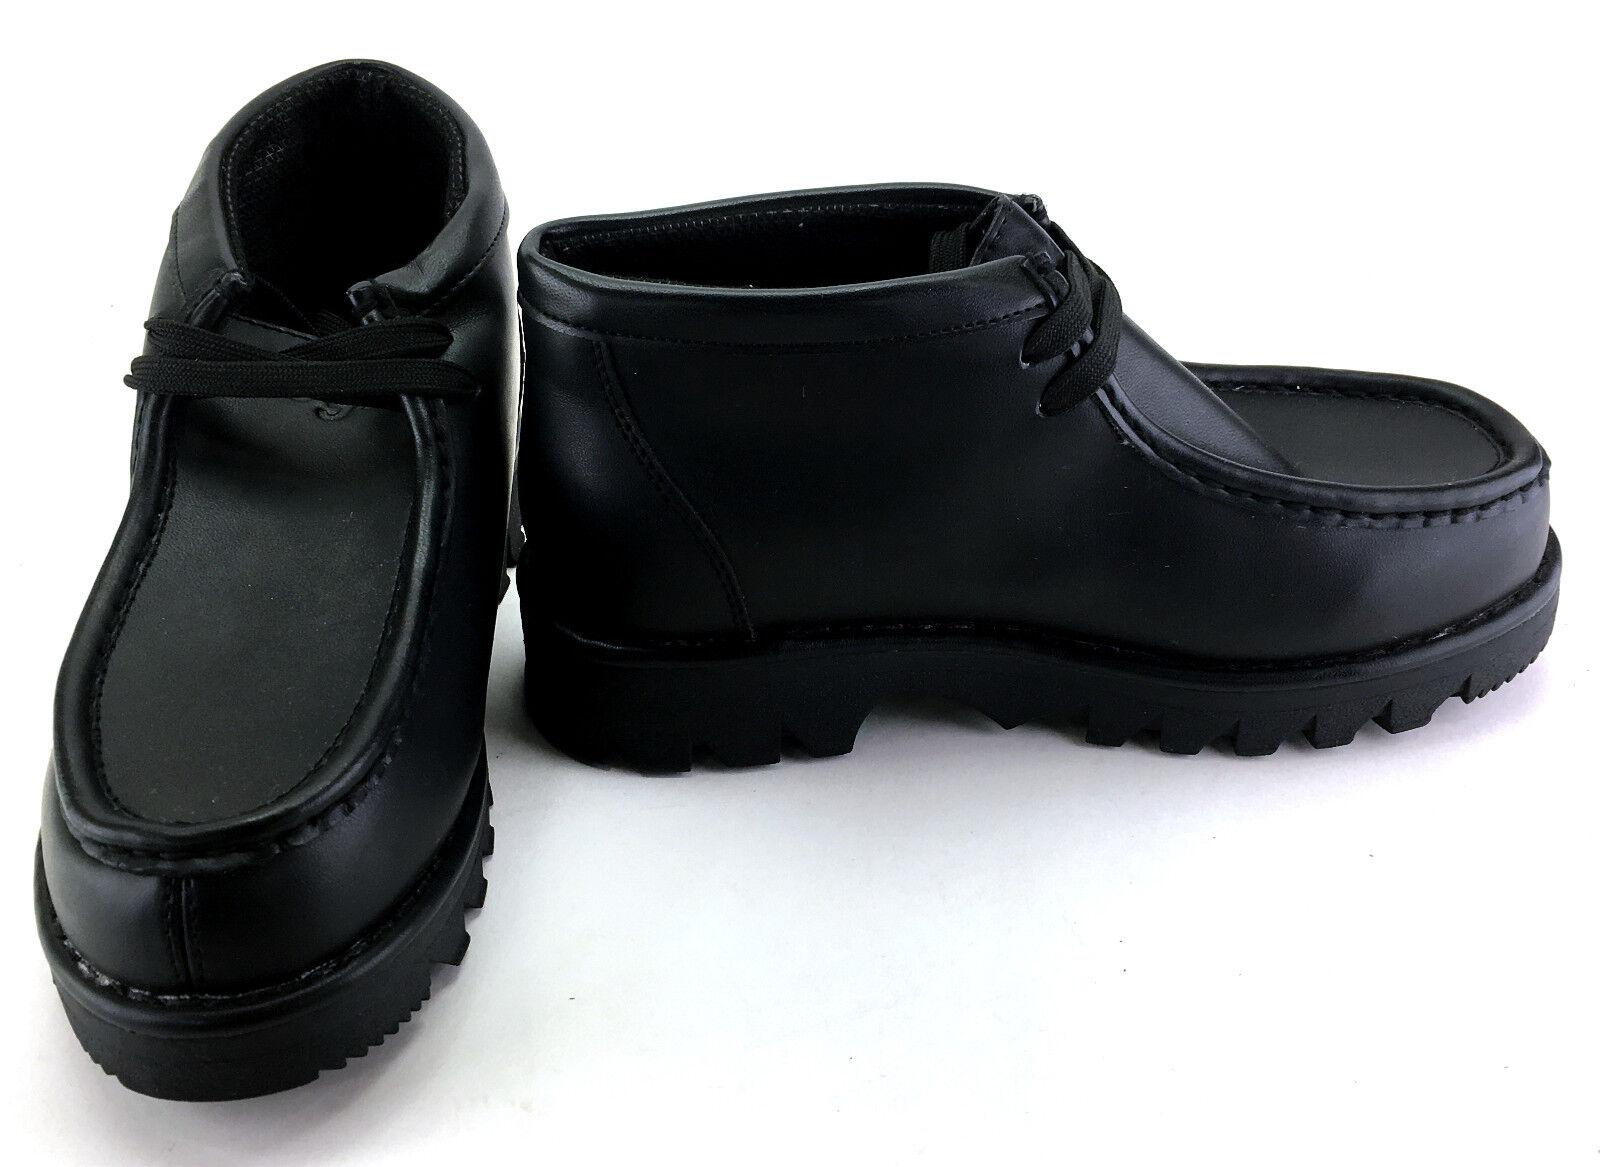 Lugz Boots Strutt Lo Classic Leather Black Shoes Size 6.5